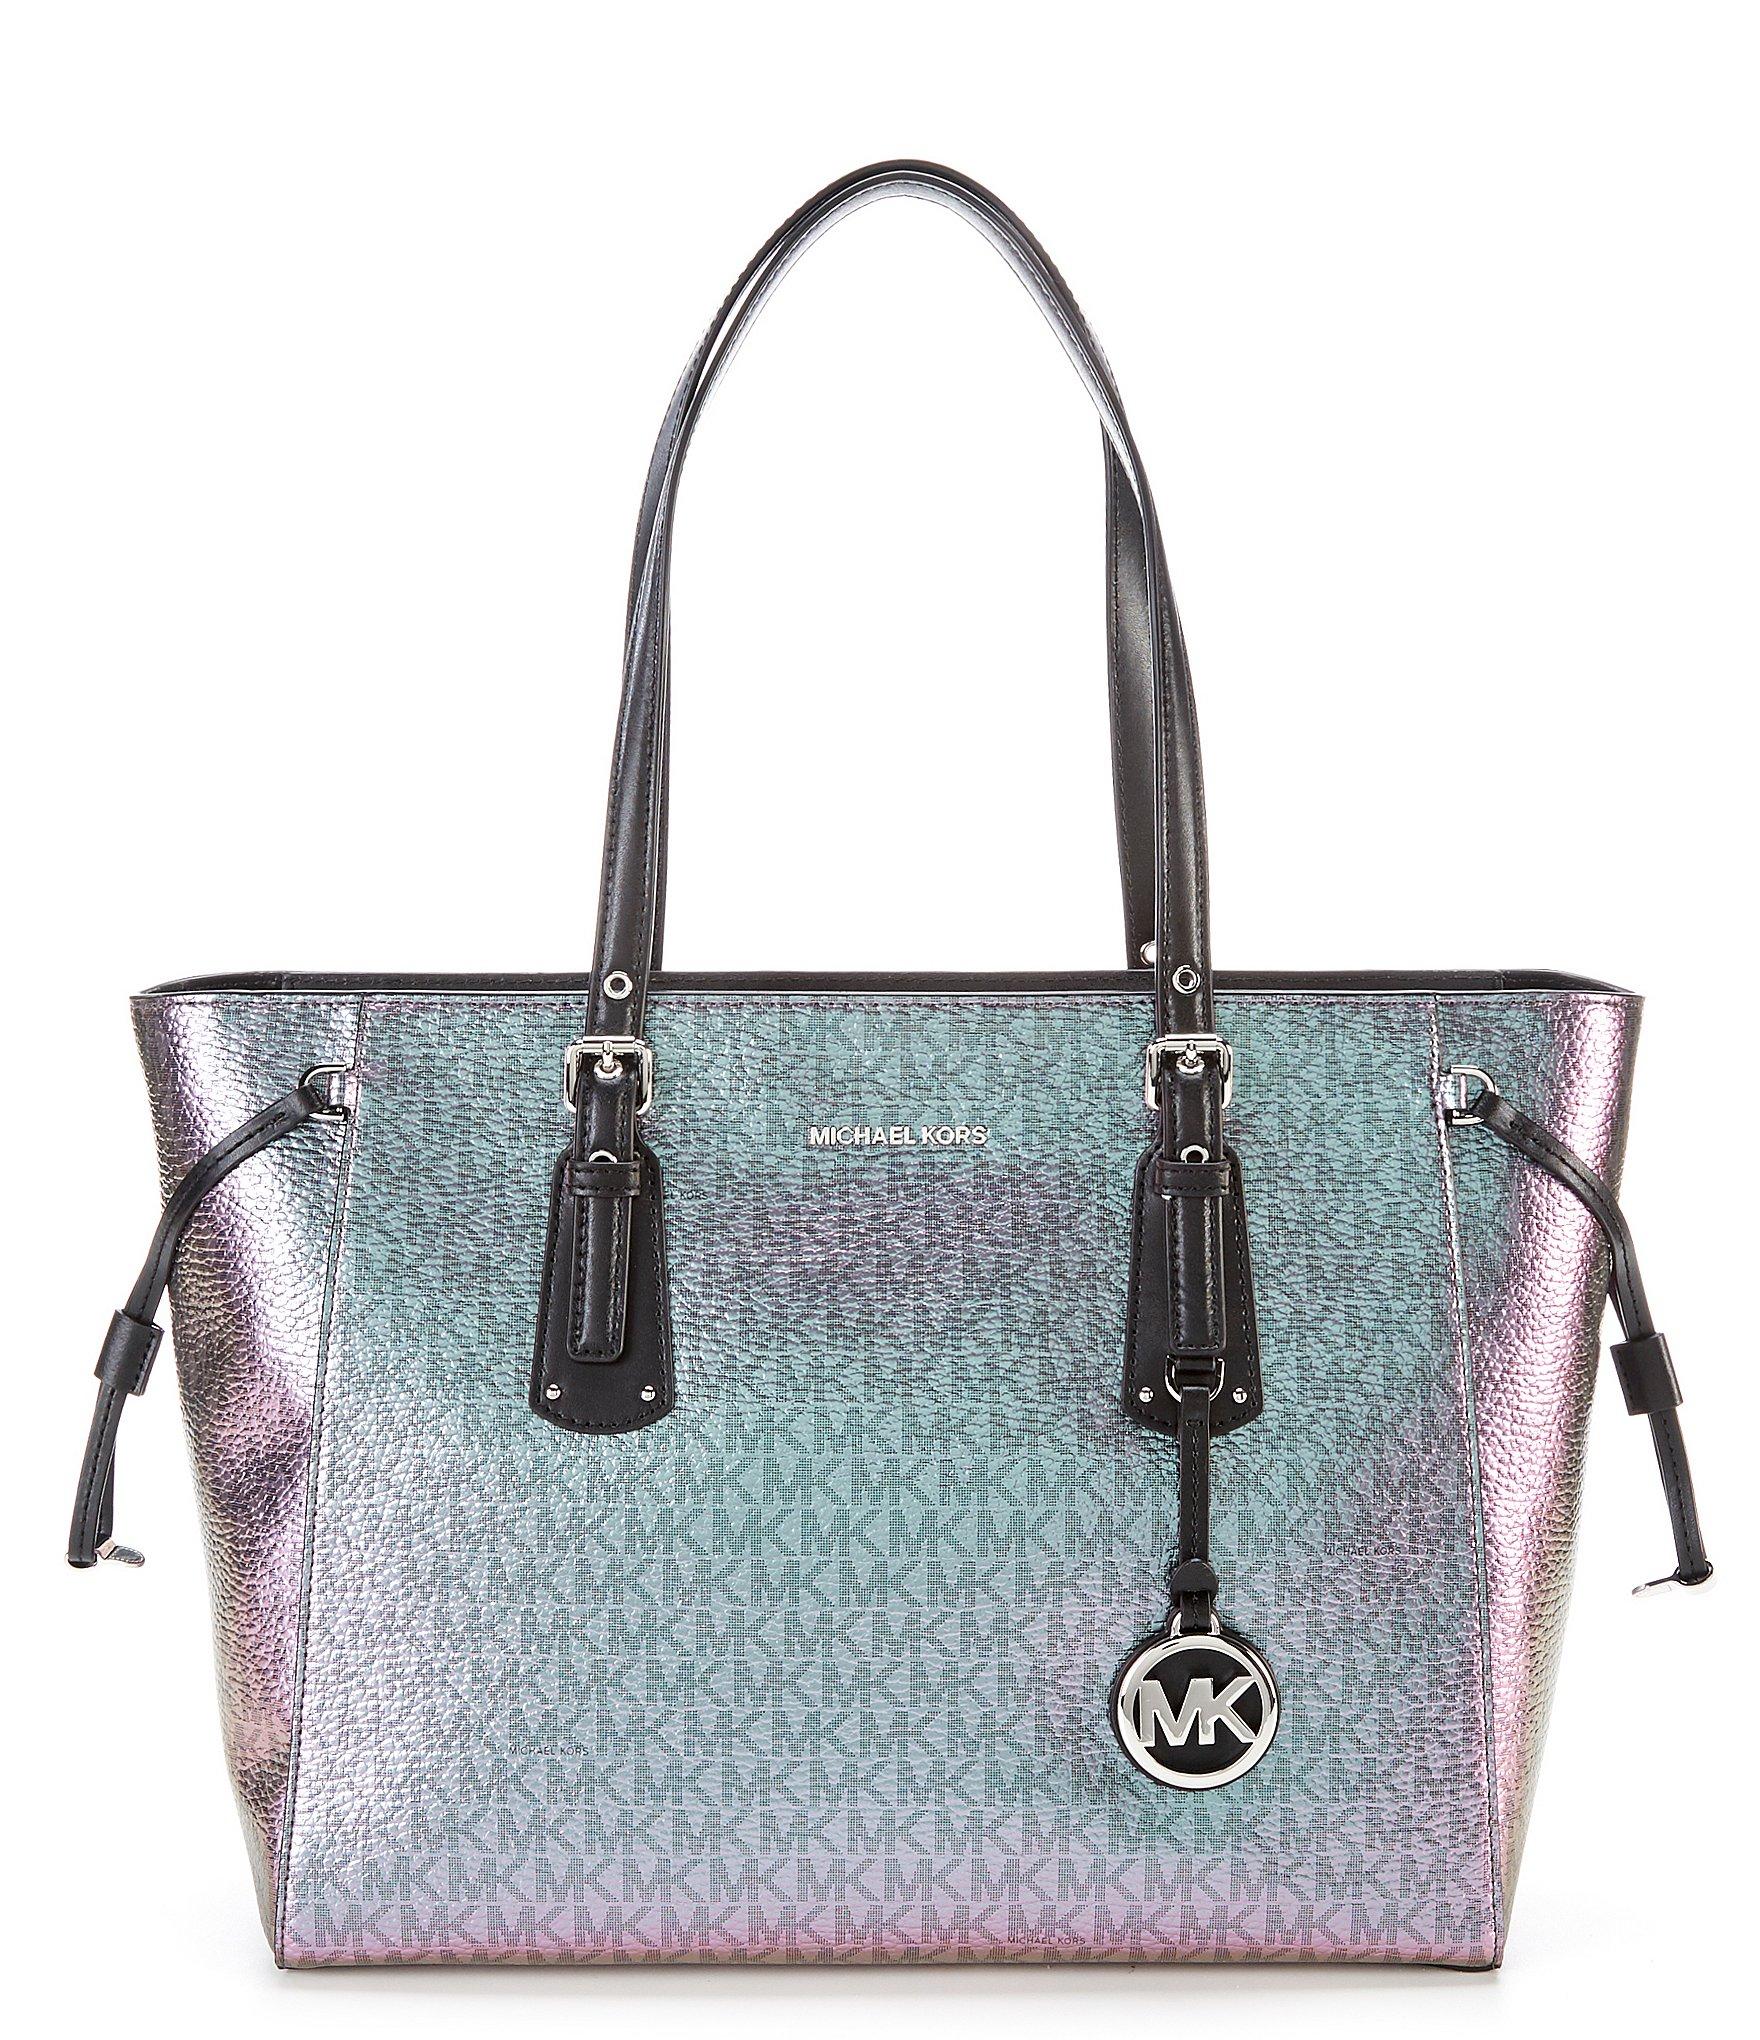 cdc53024e928 mk handbags outlet clearance dillards michael kors handbags new arrival